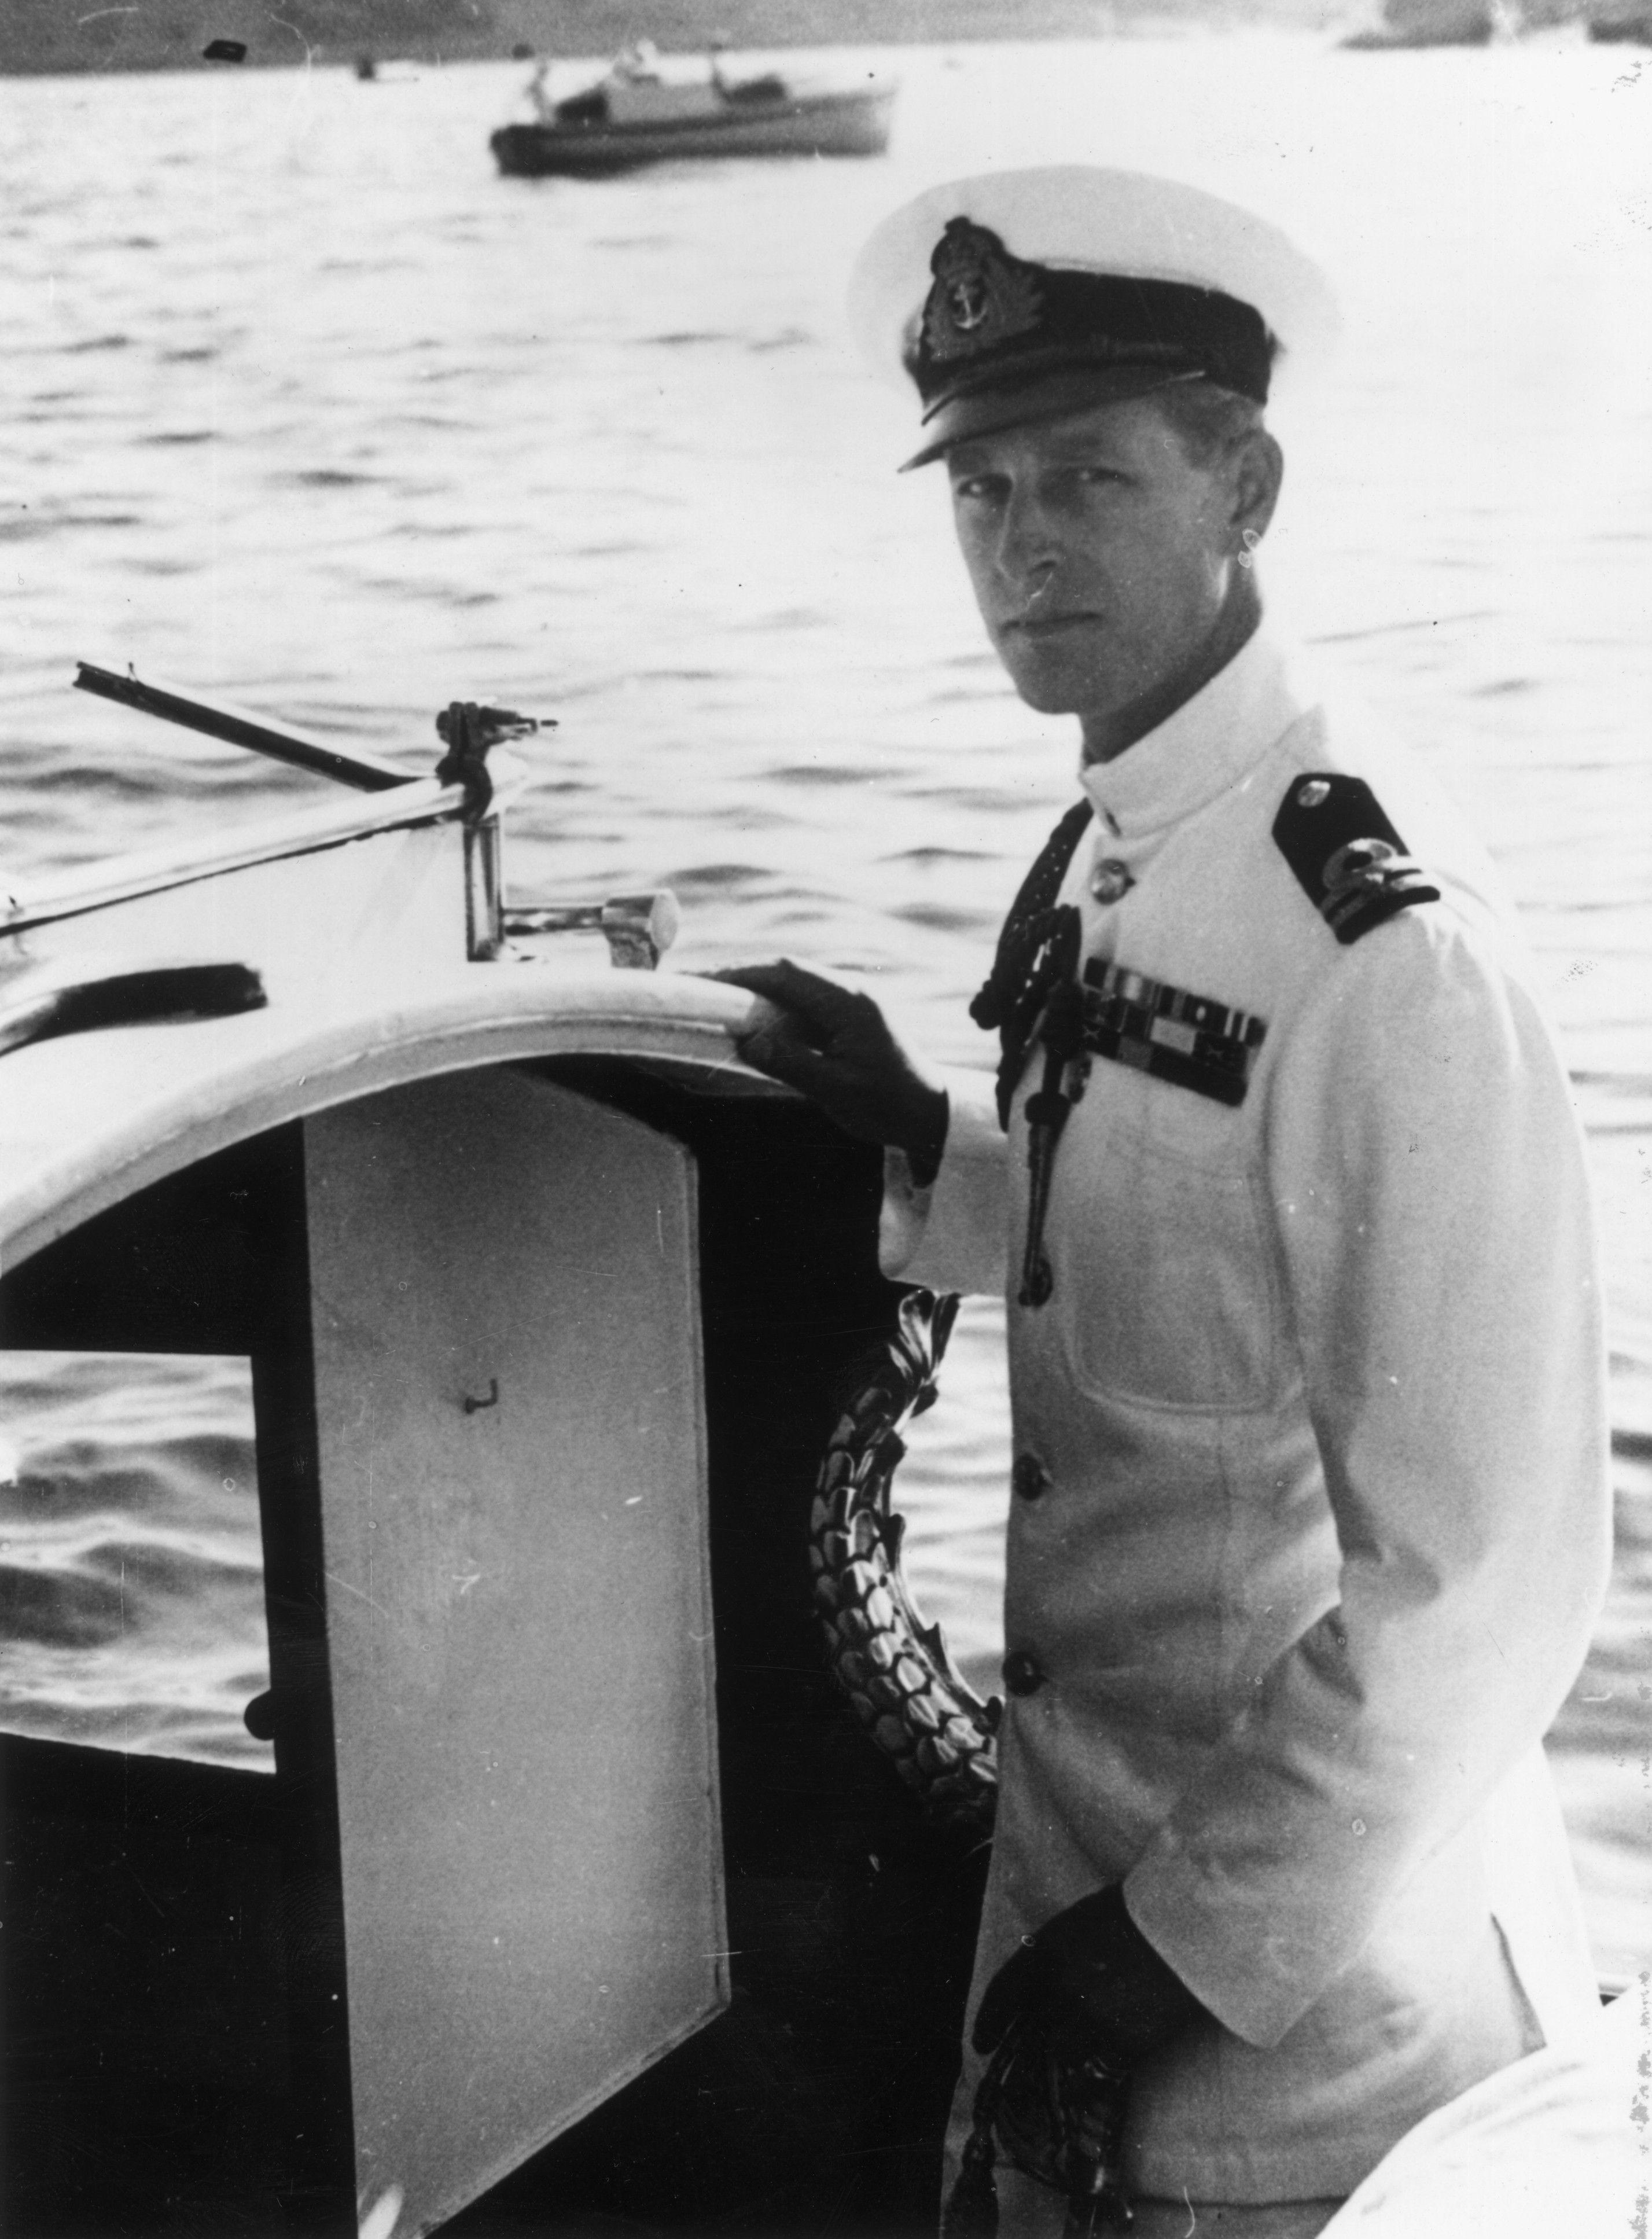 Commander of the seas